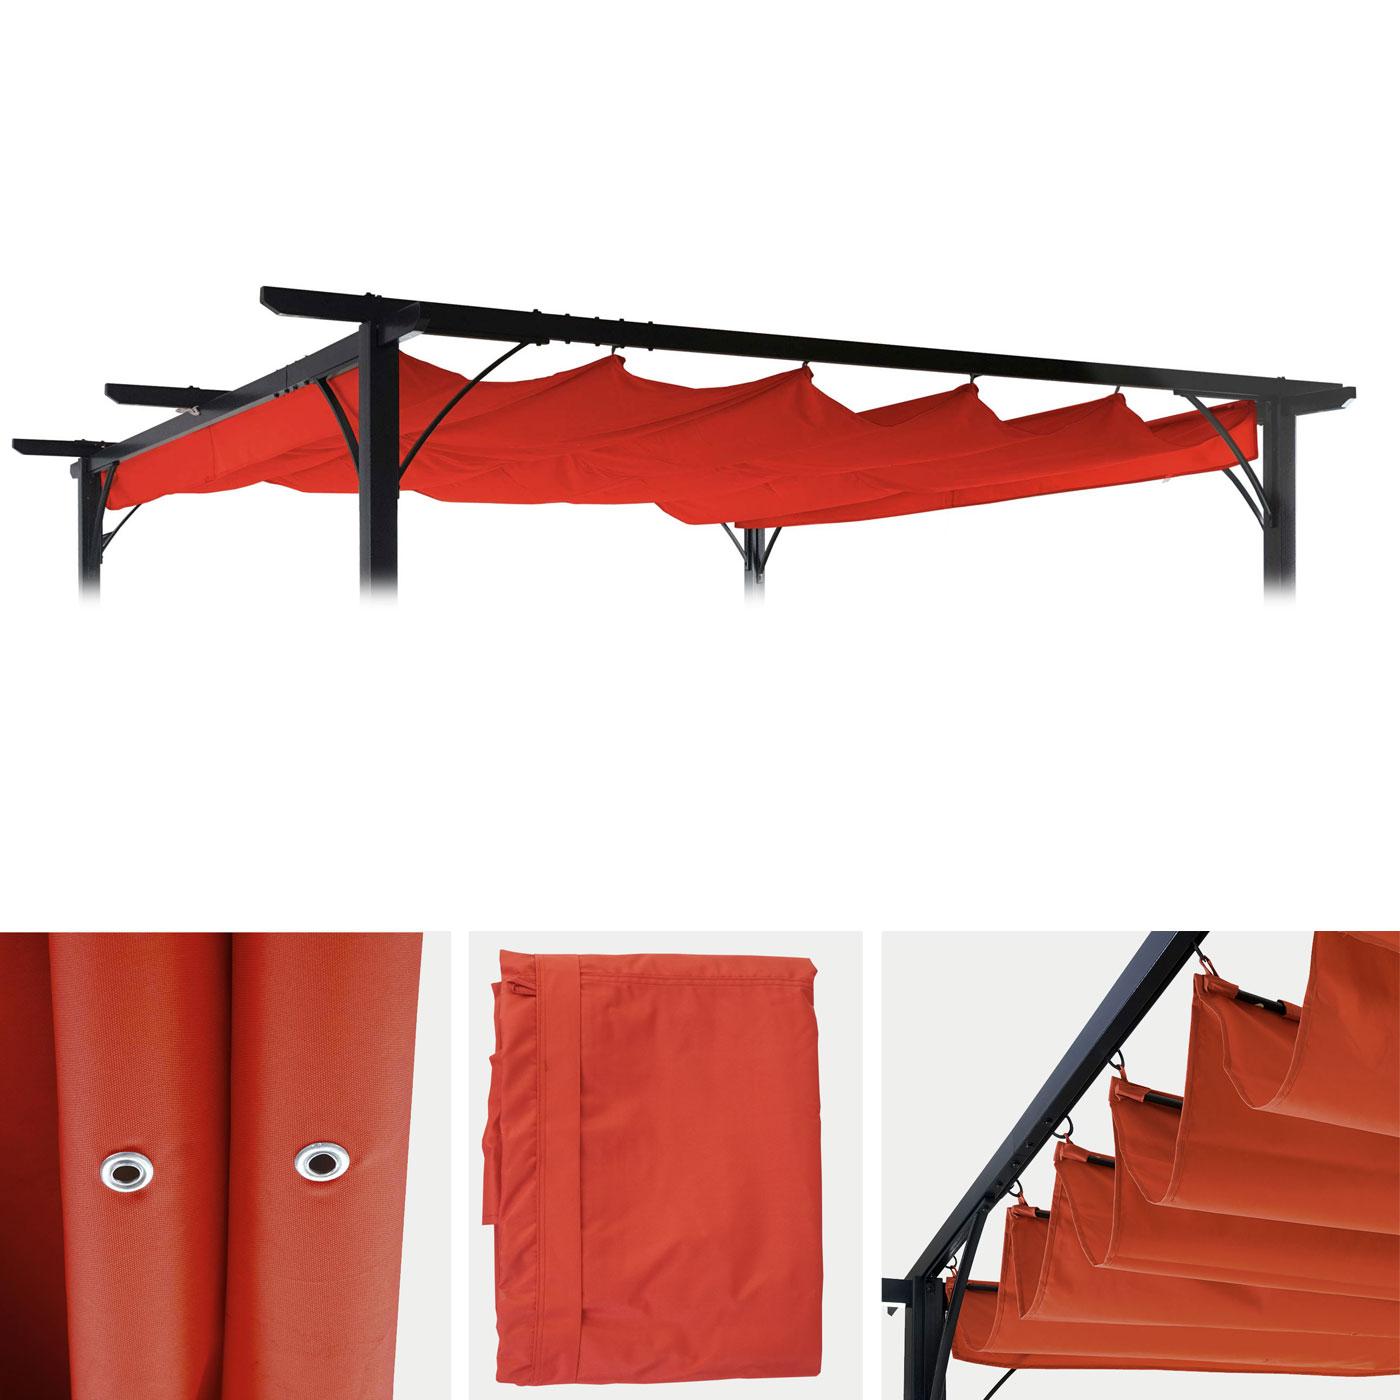 ersatzdach f r pergola 3 5x3 5m hwc c42 schiebedach bezug sonnenschutz terrakotta. Black Bedroom Furniture Sets. Home Design Ideas